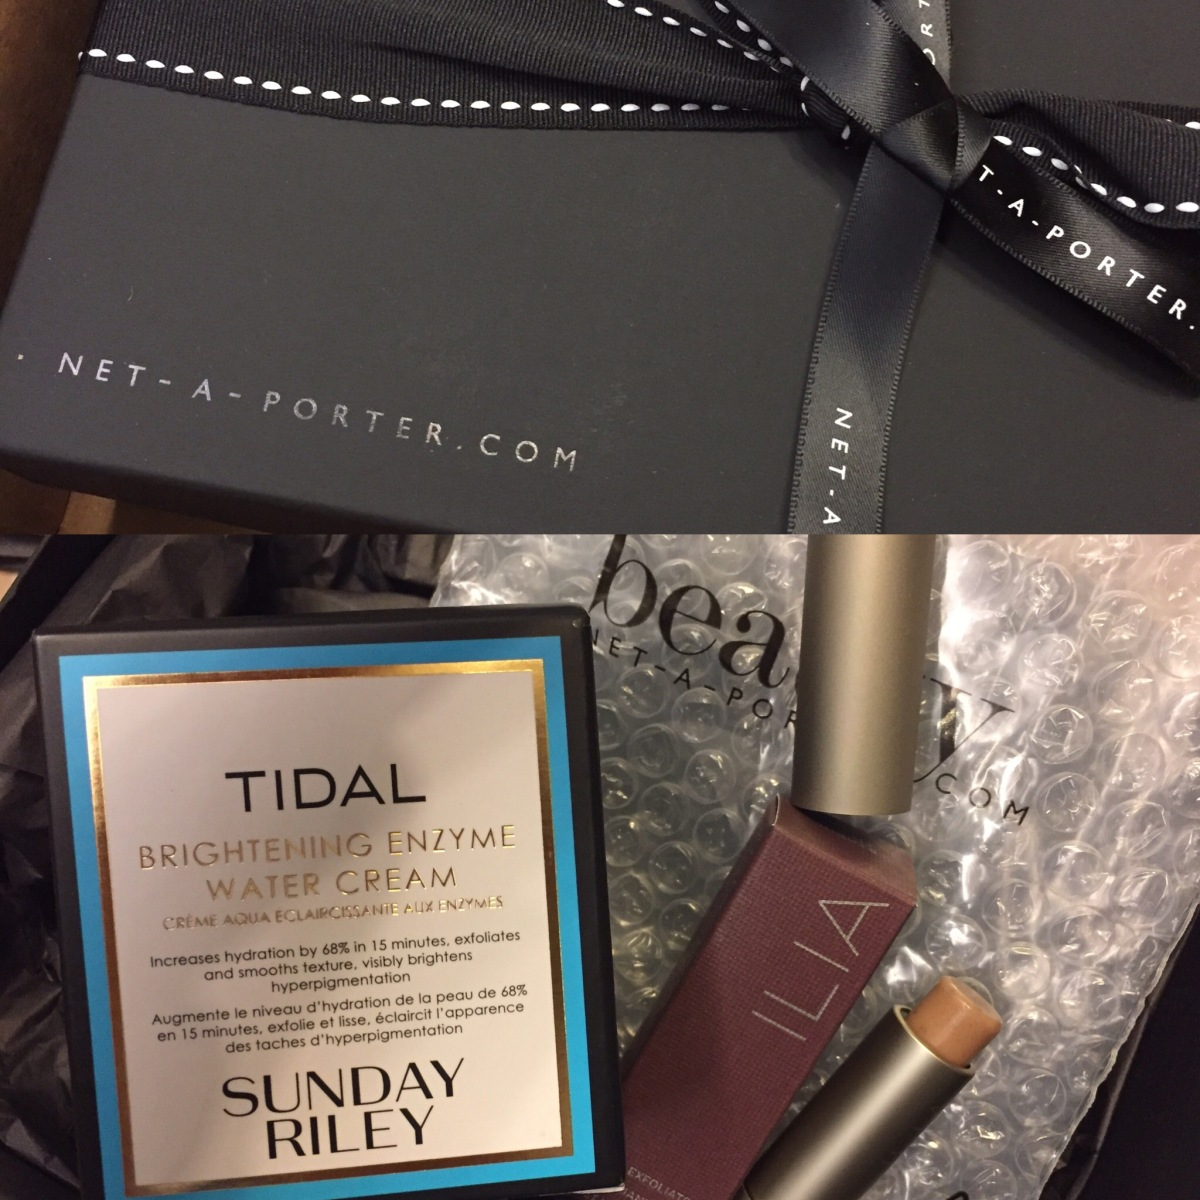 My Net-a-Porter Shopping - Sunday Riley Water Cream & ILIA Lip Exfoliator